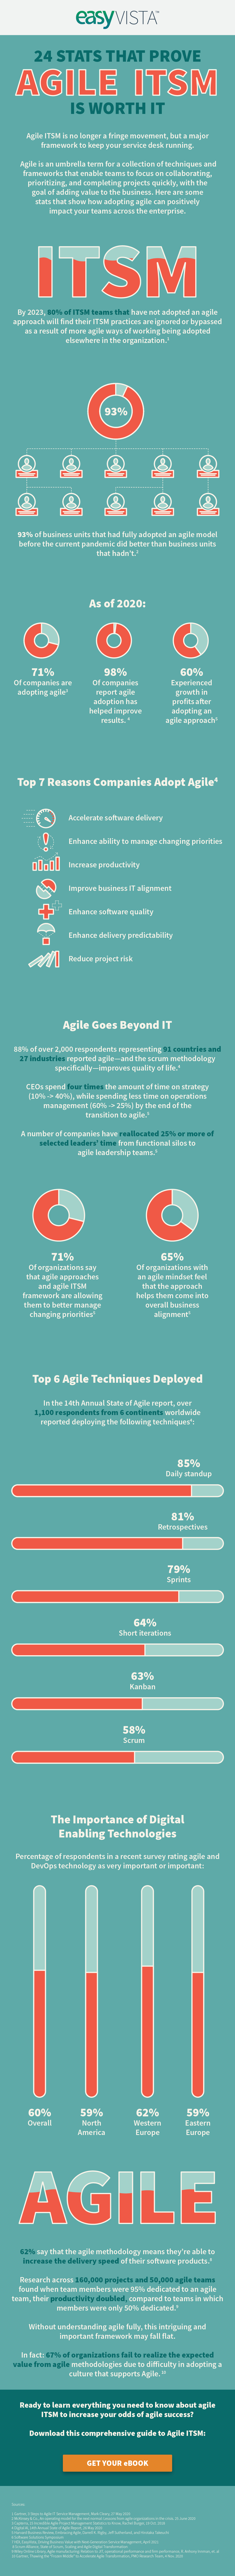 TheUltimateGuidetoAgile-Infographic_CTA